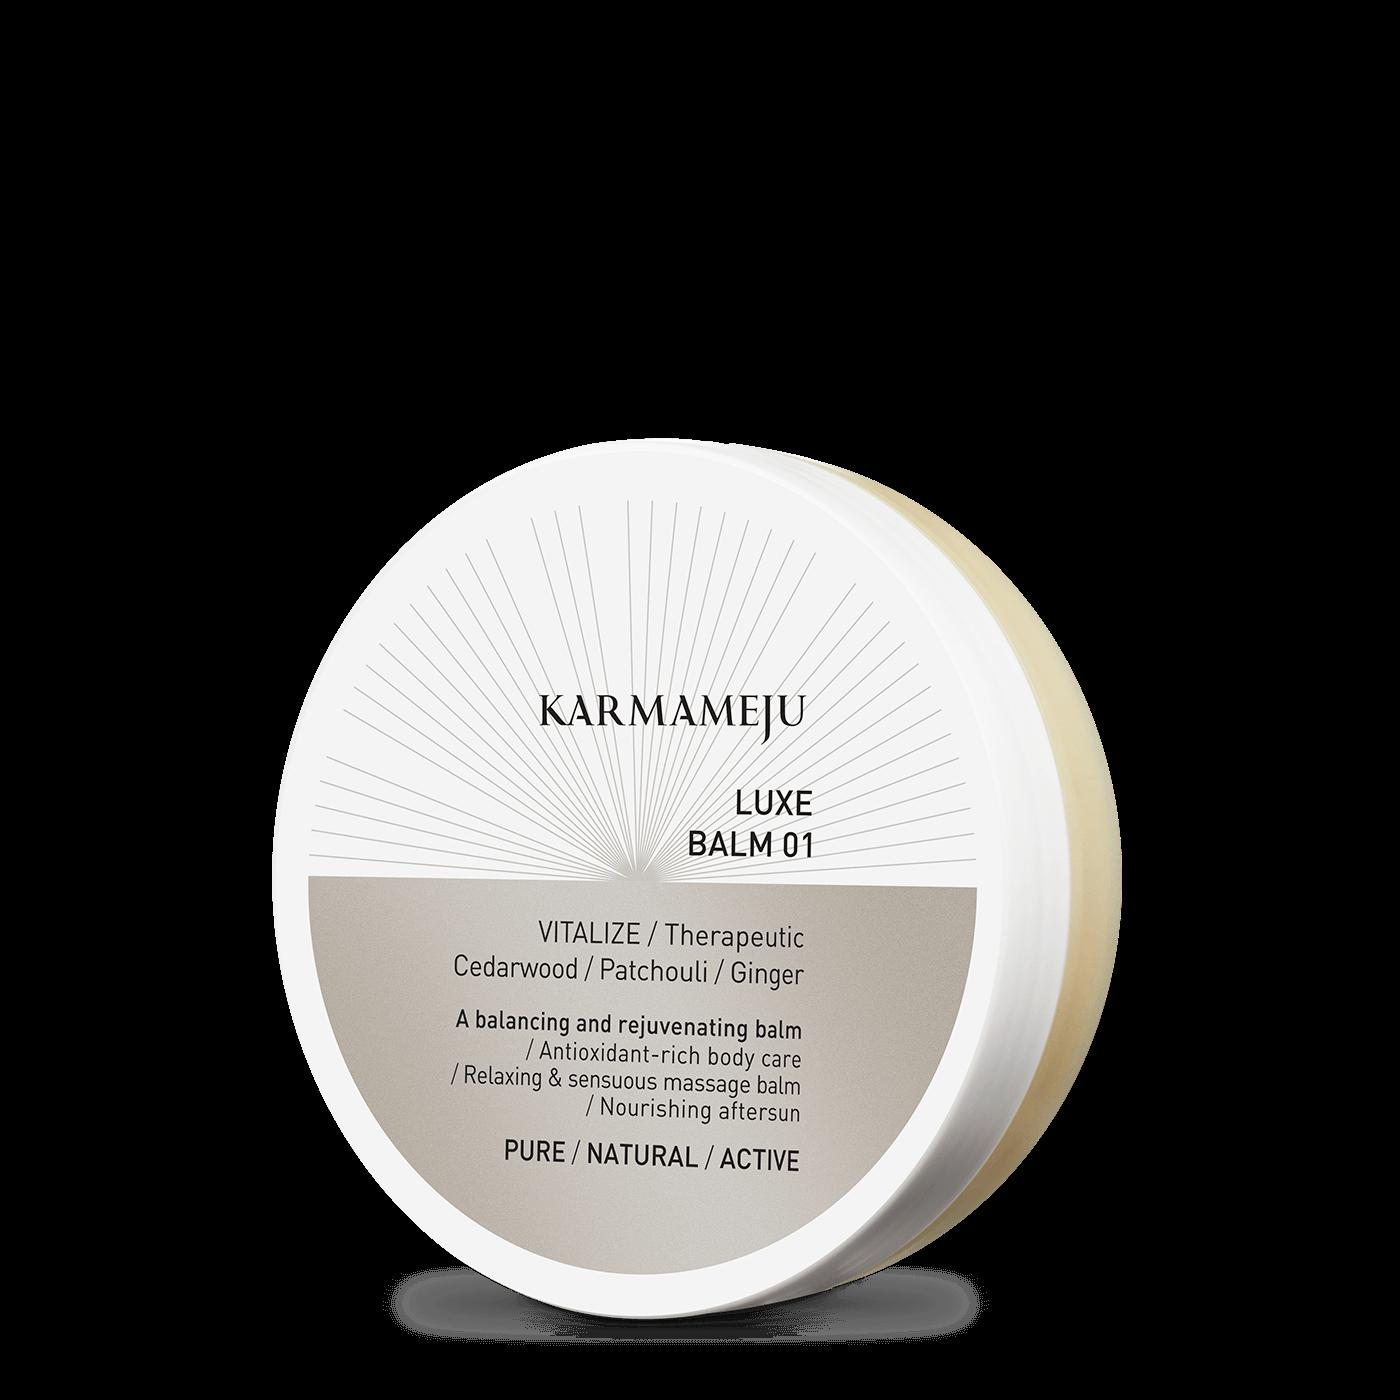 Karmameju LUXE / BALM 01